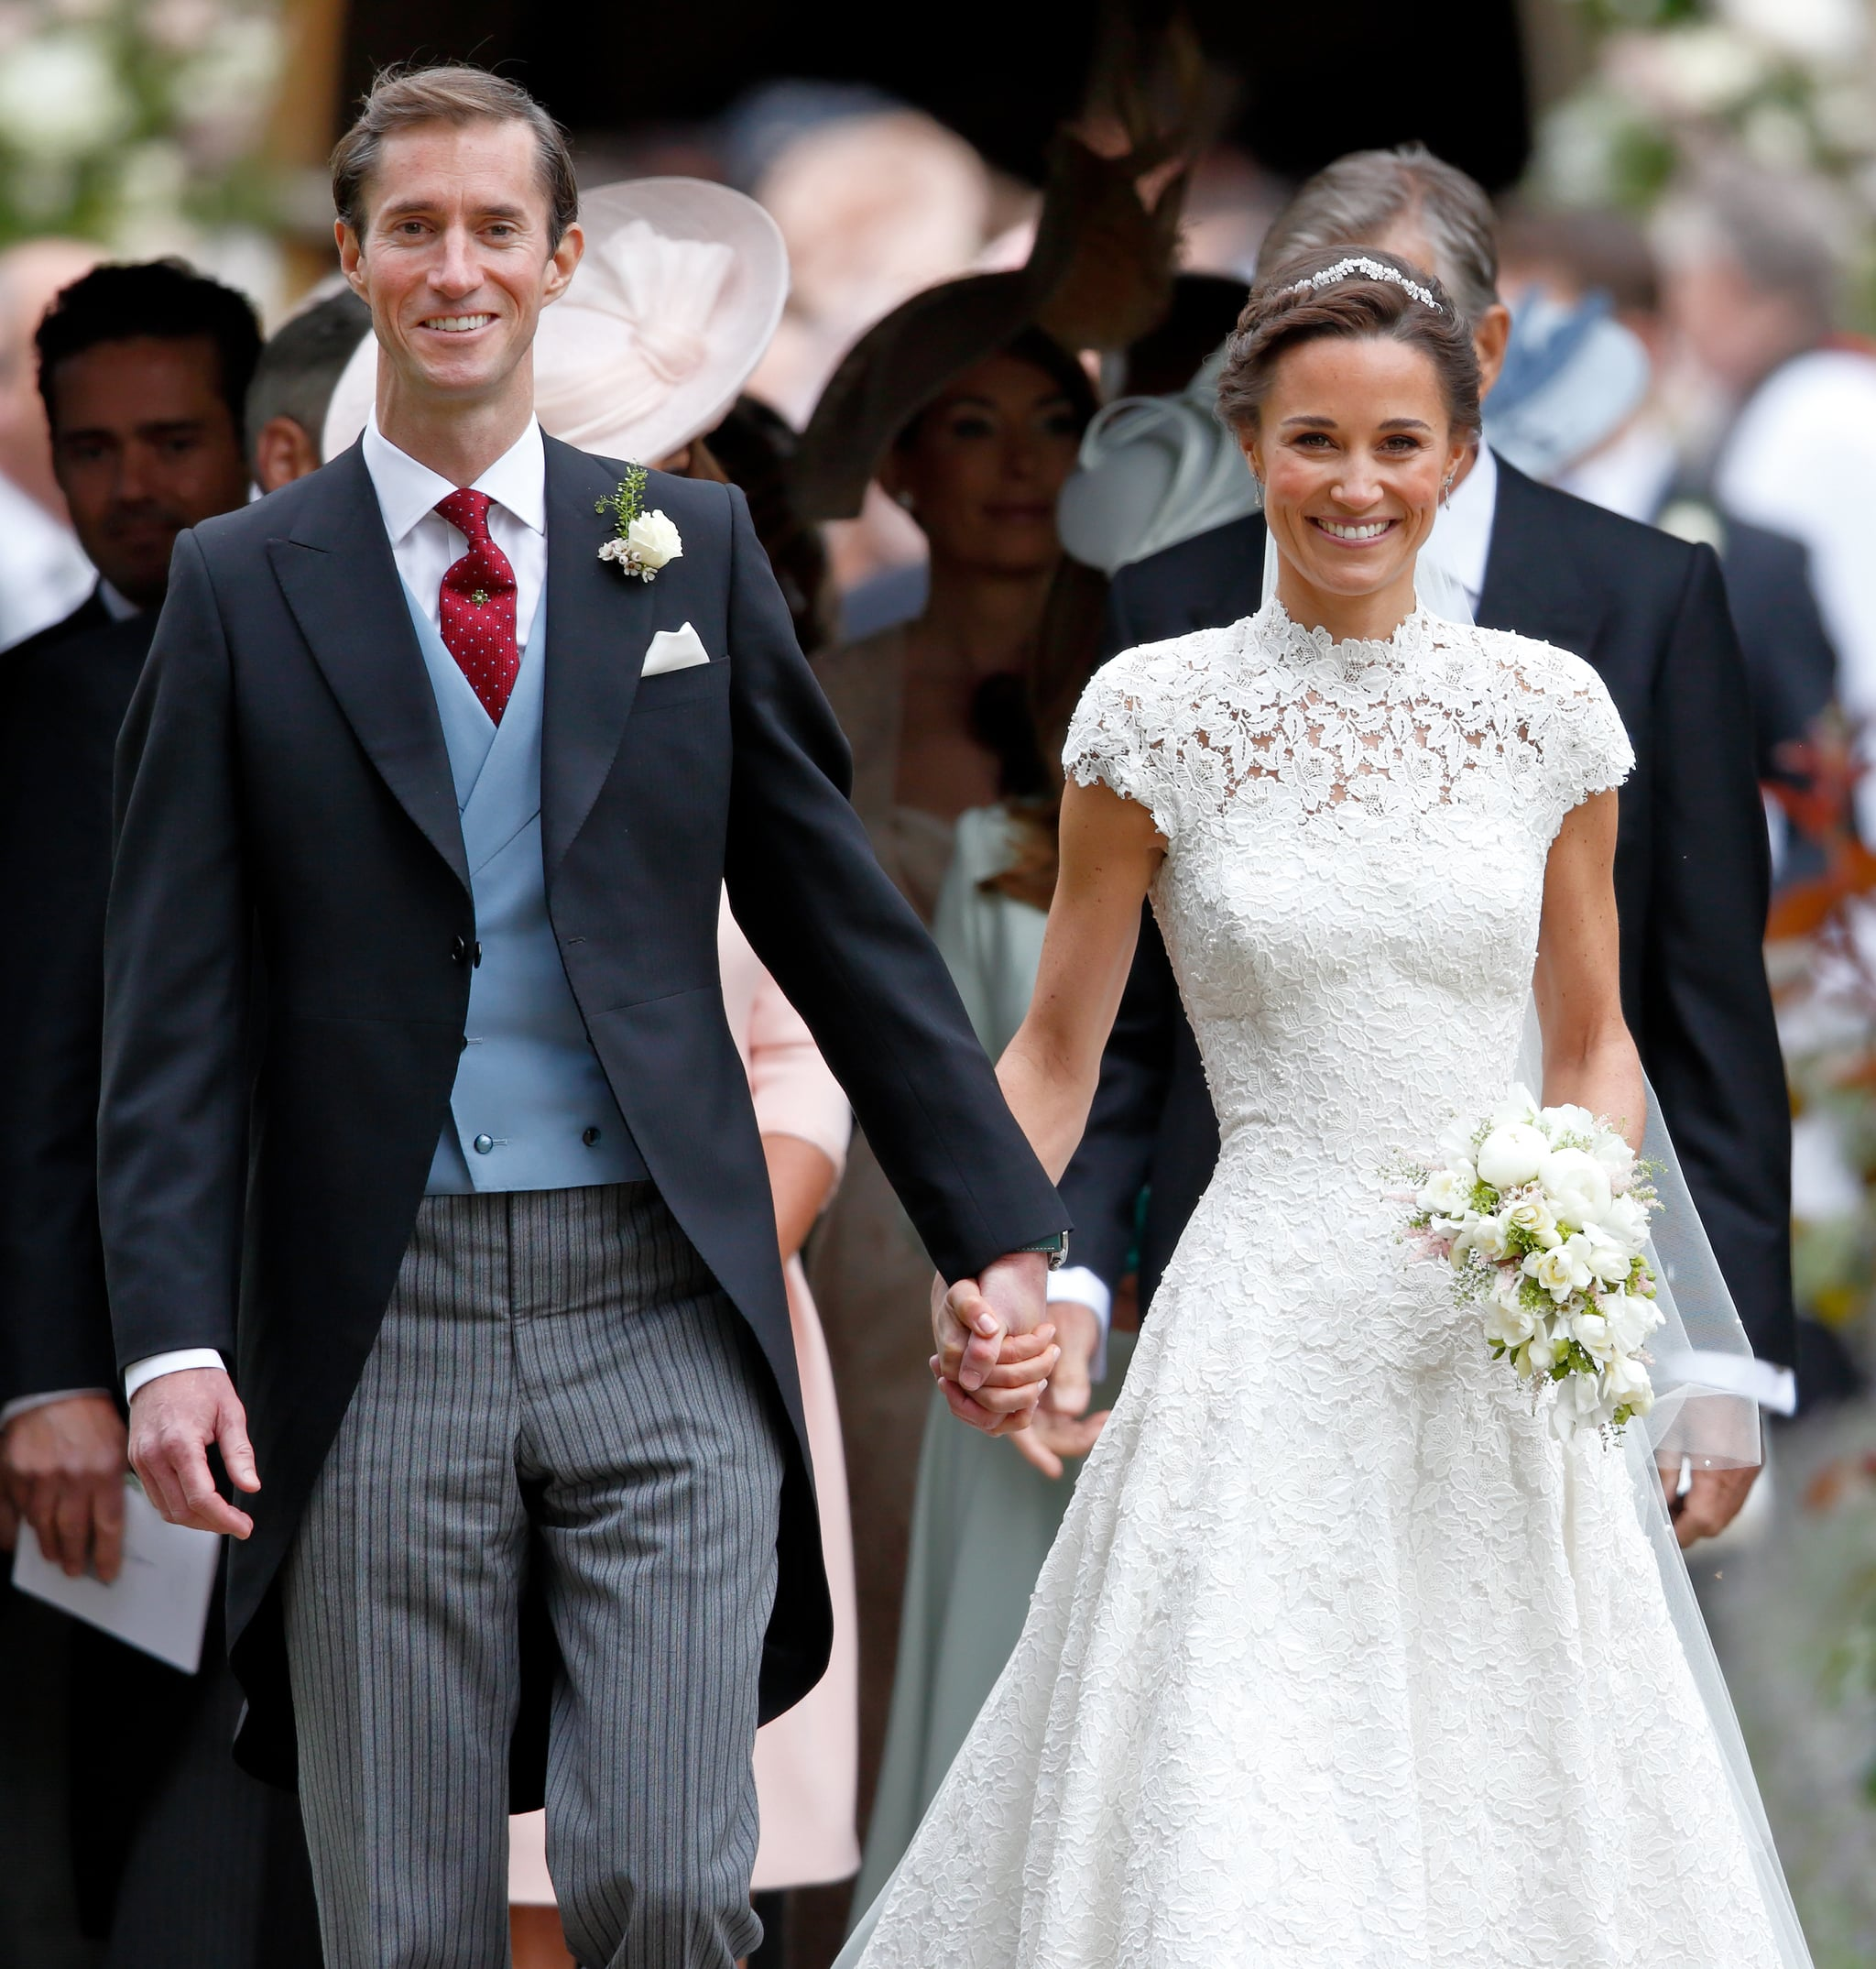 Man's Wedding Dress